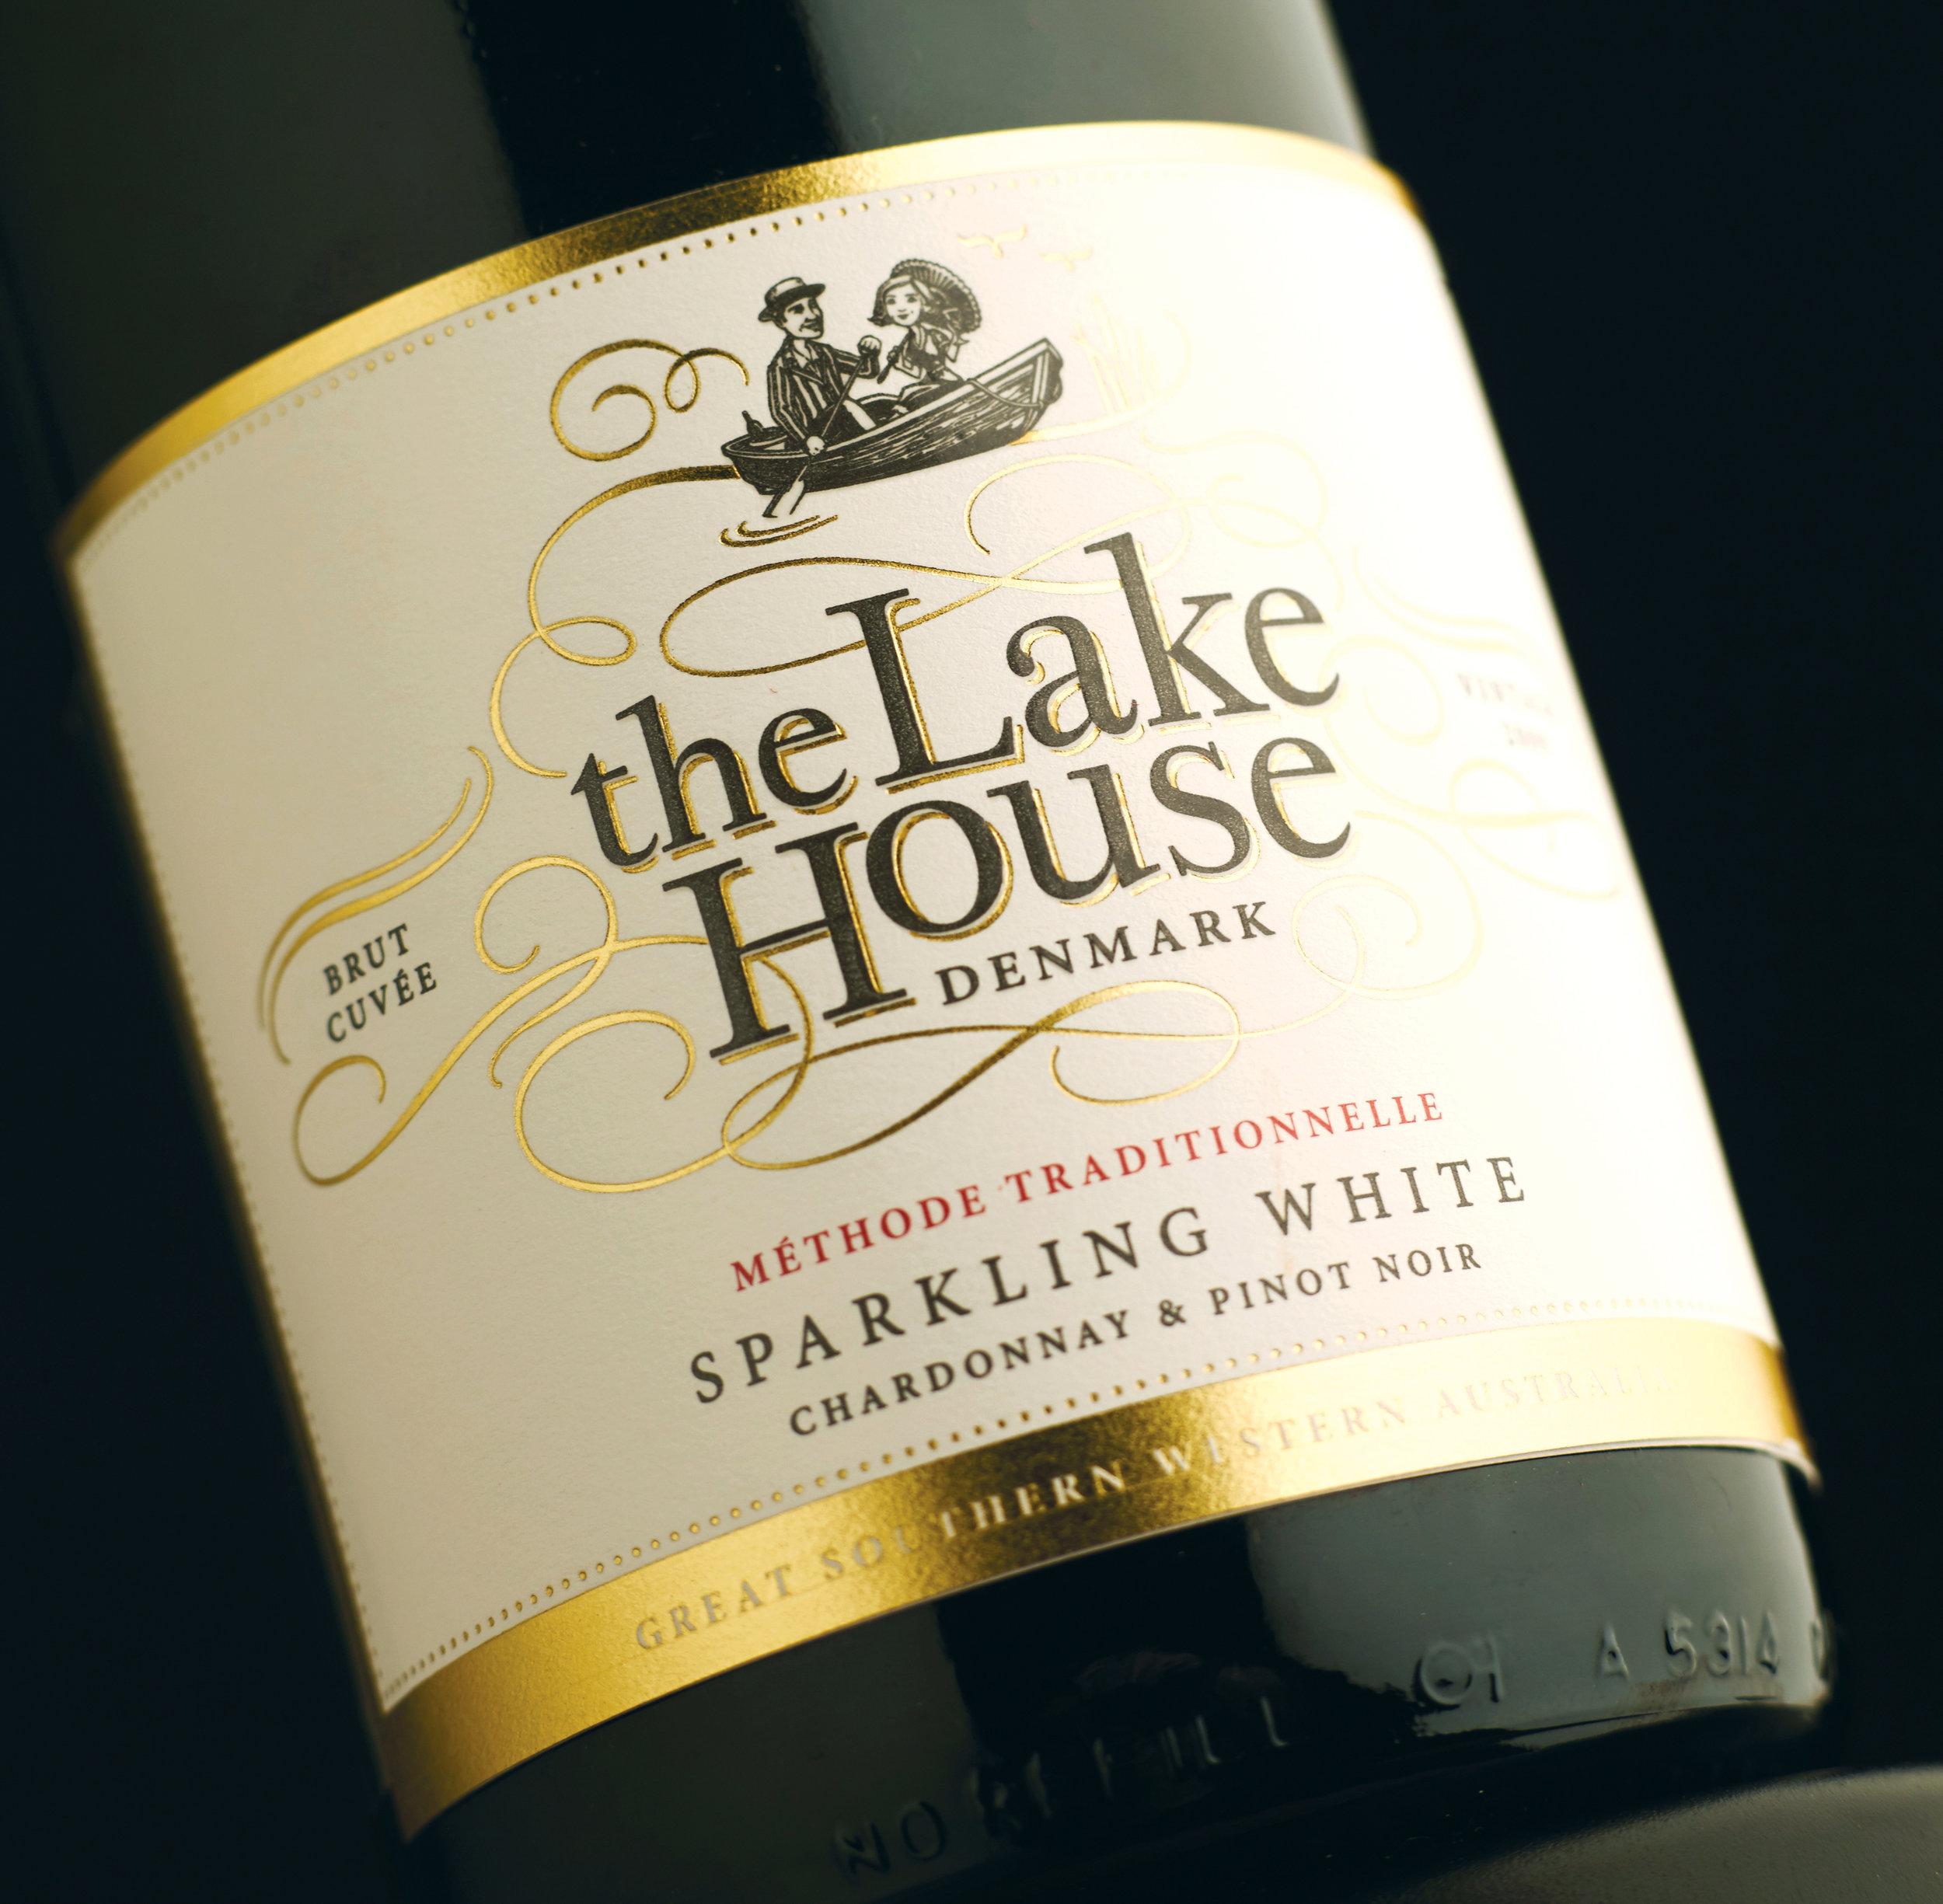 The Lake House Denmark wine label design